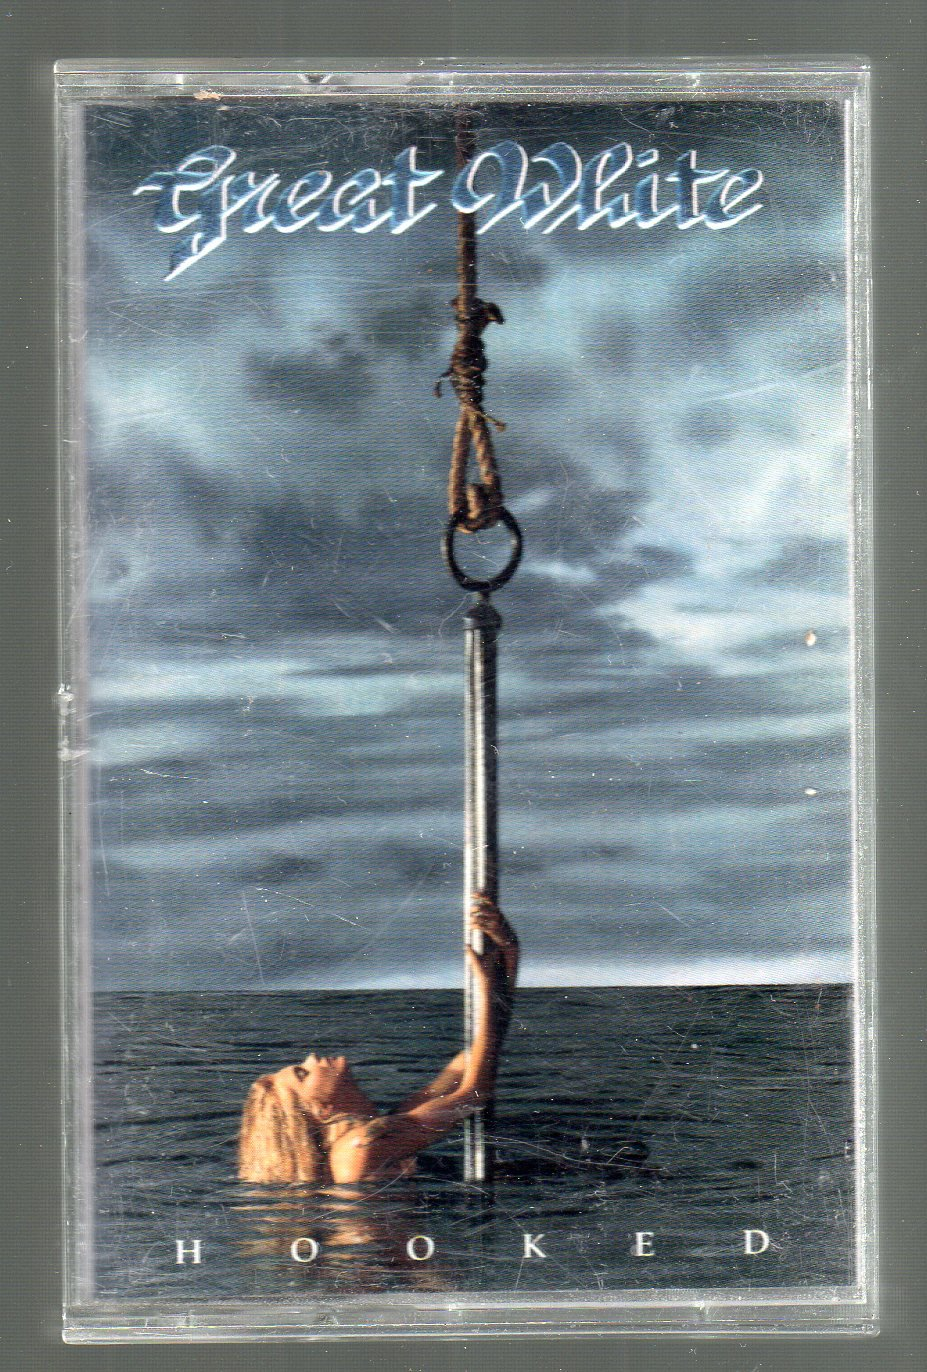 Great White - Hooked Cassette Tape